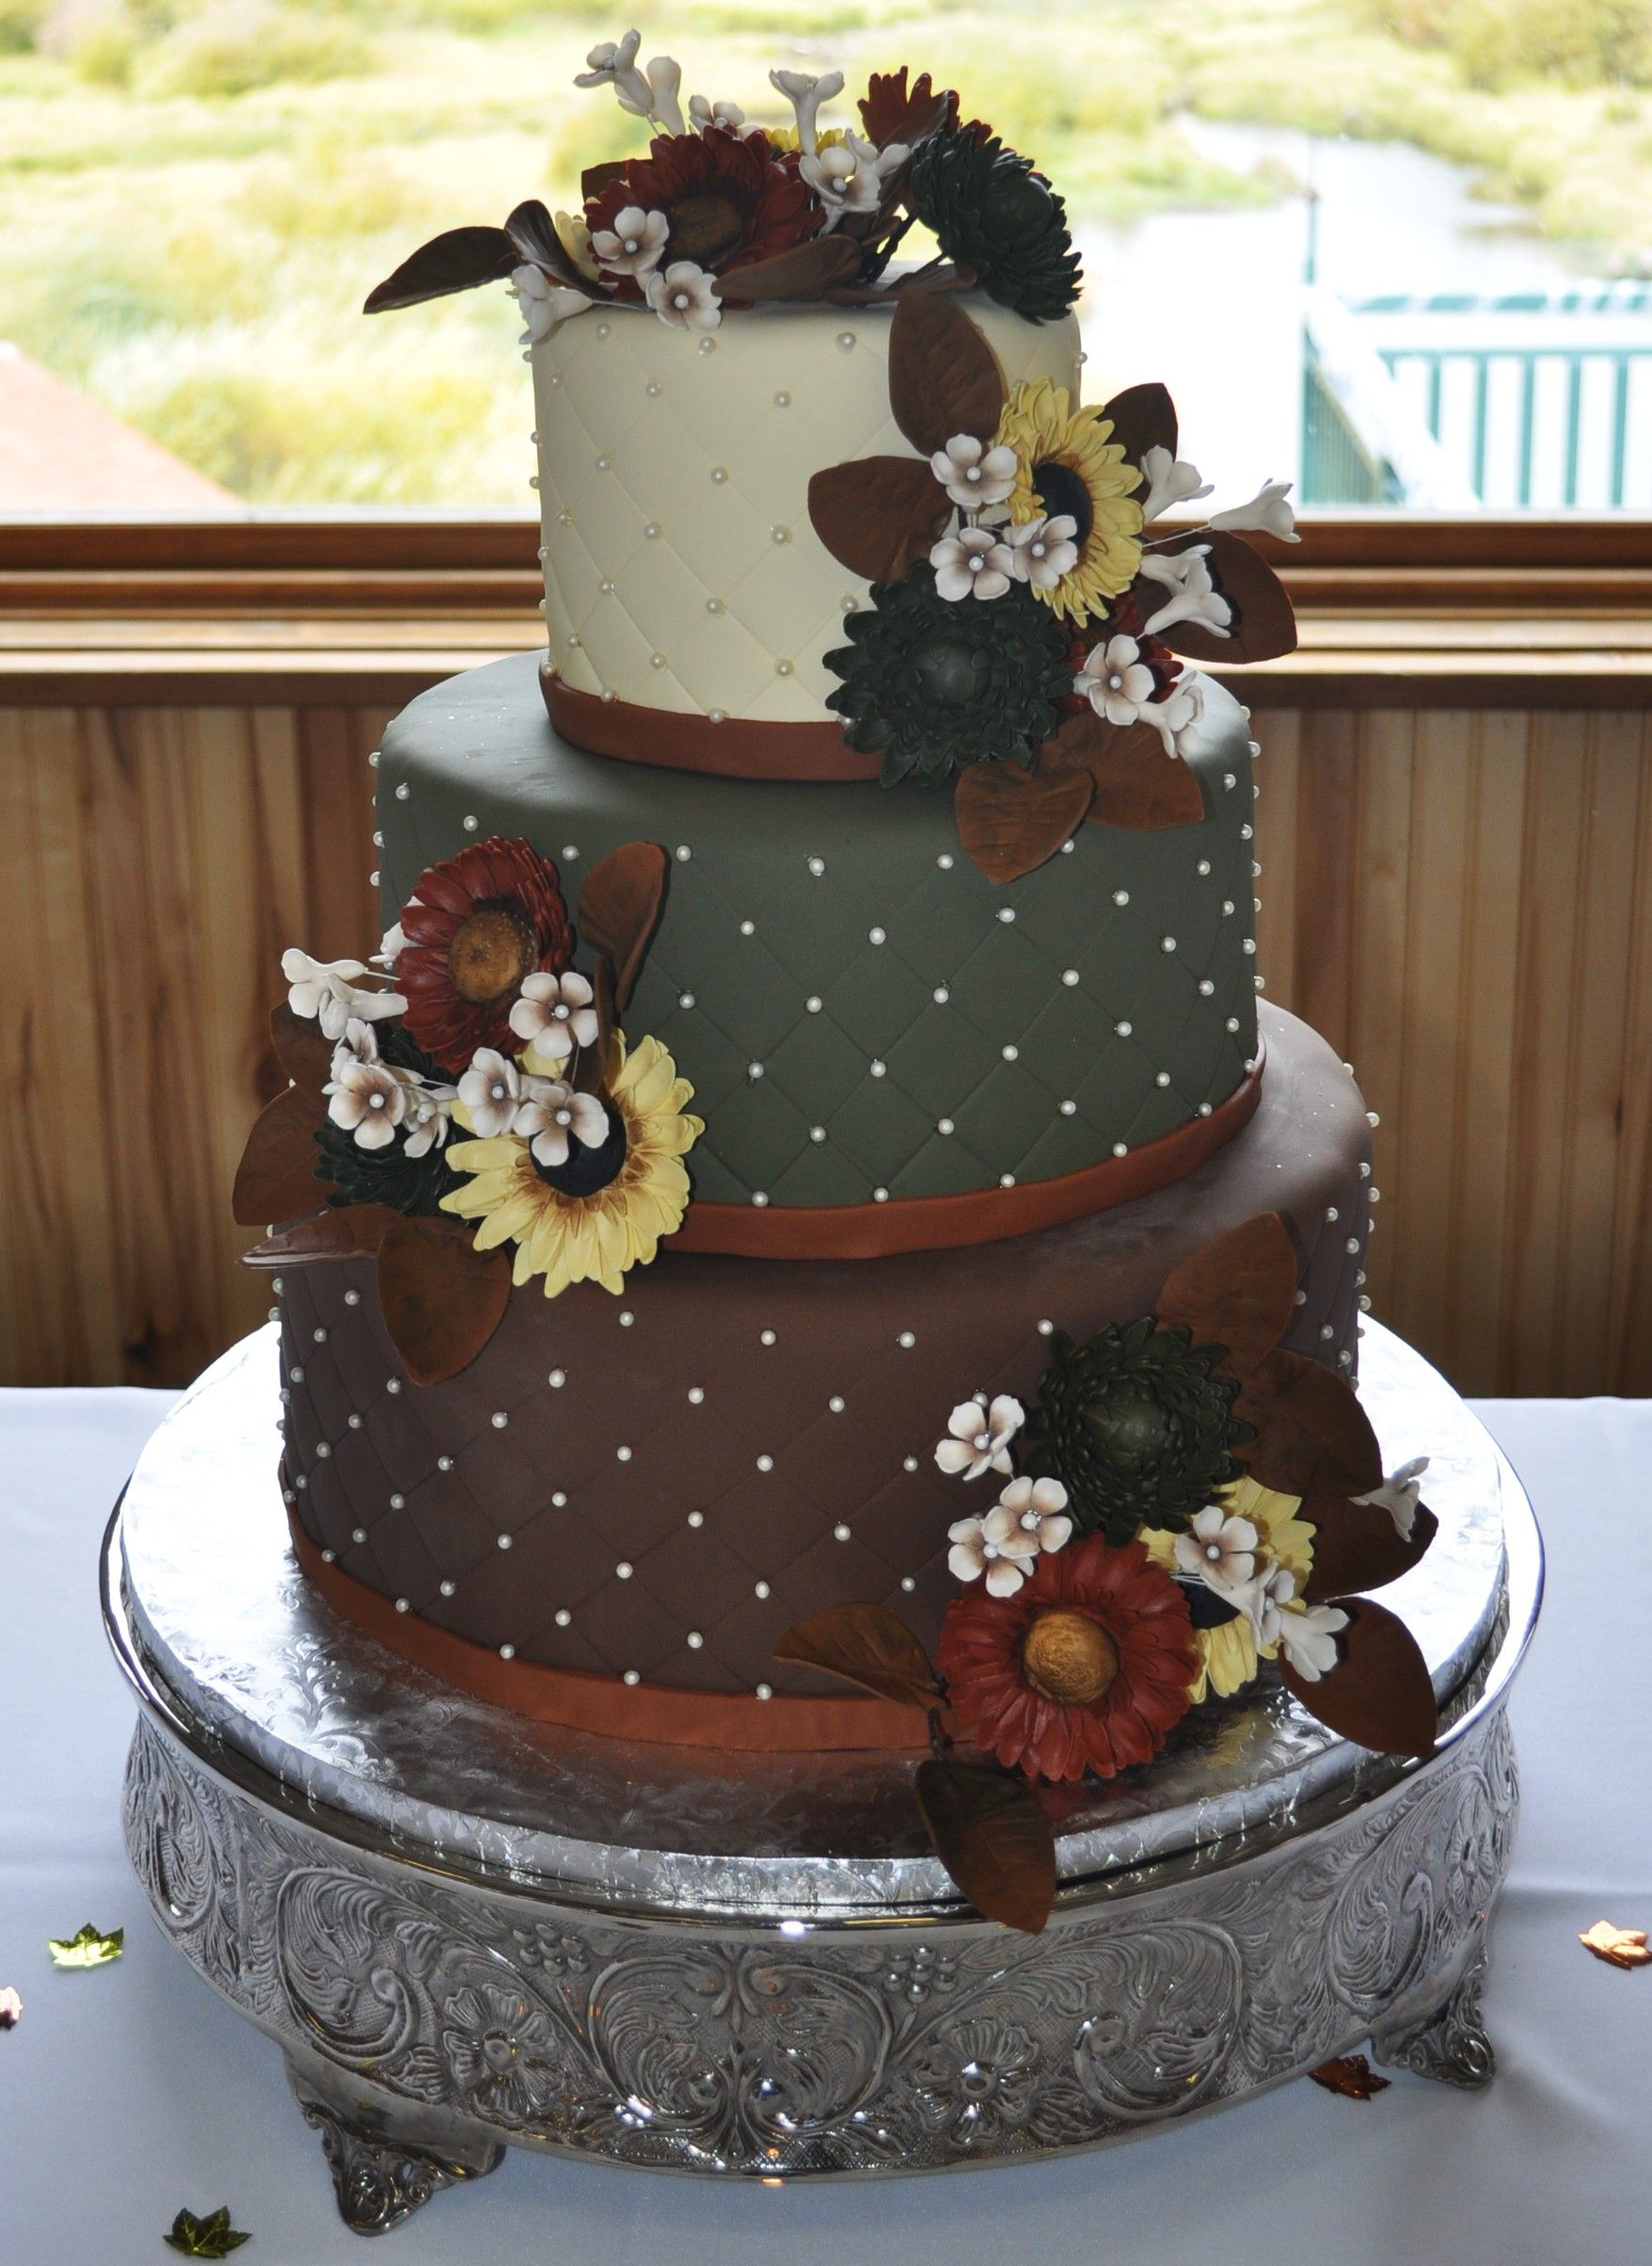 Autumn Wedding Cake With Sugar Flowers